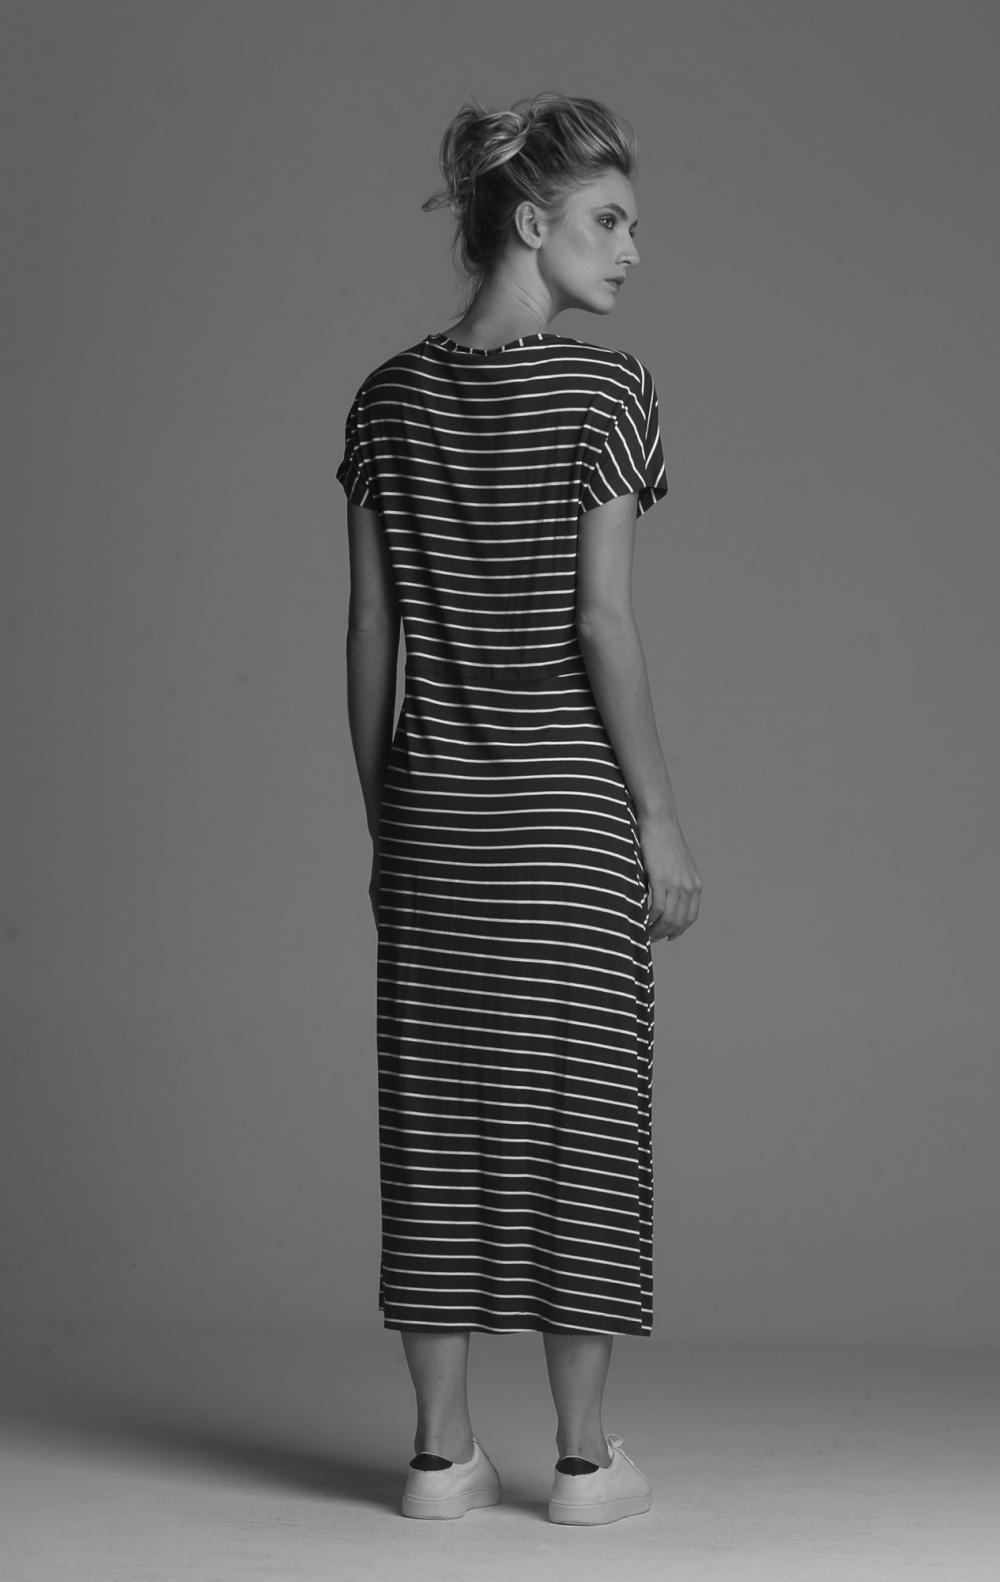 Vestido Malha Listras Marinho - Foto 2